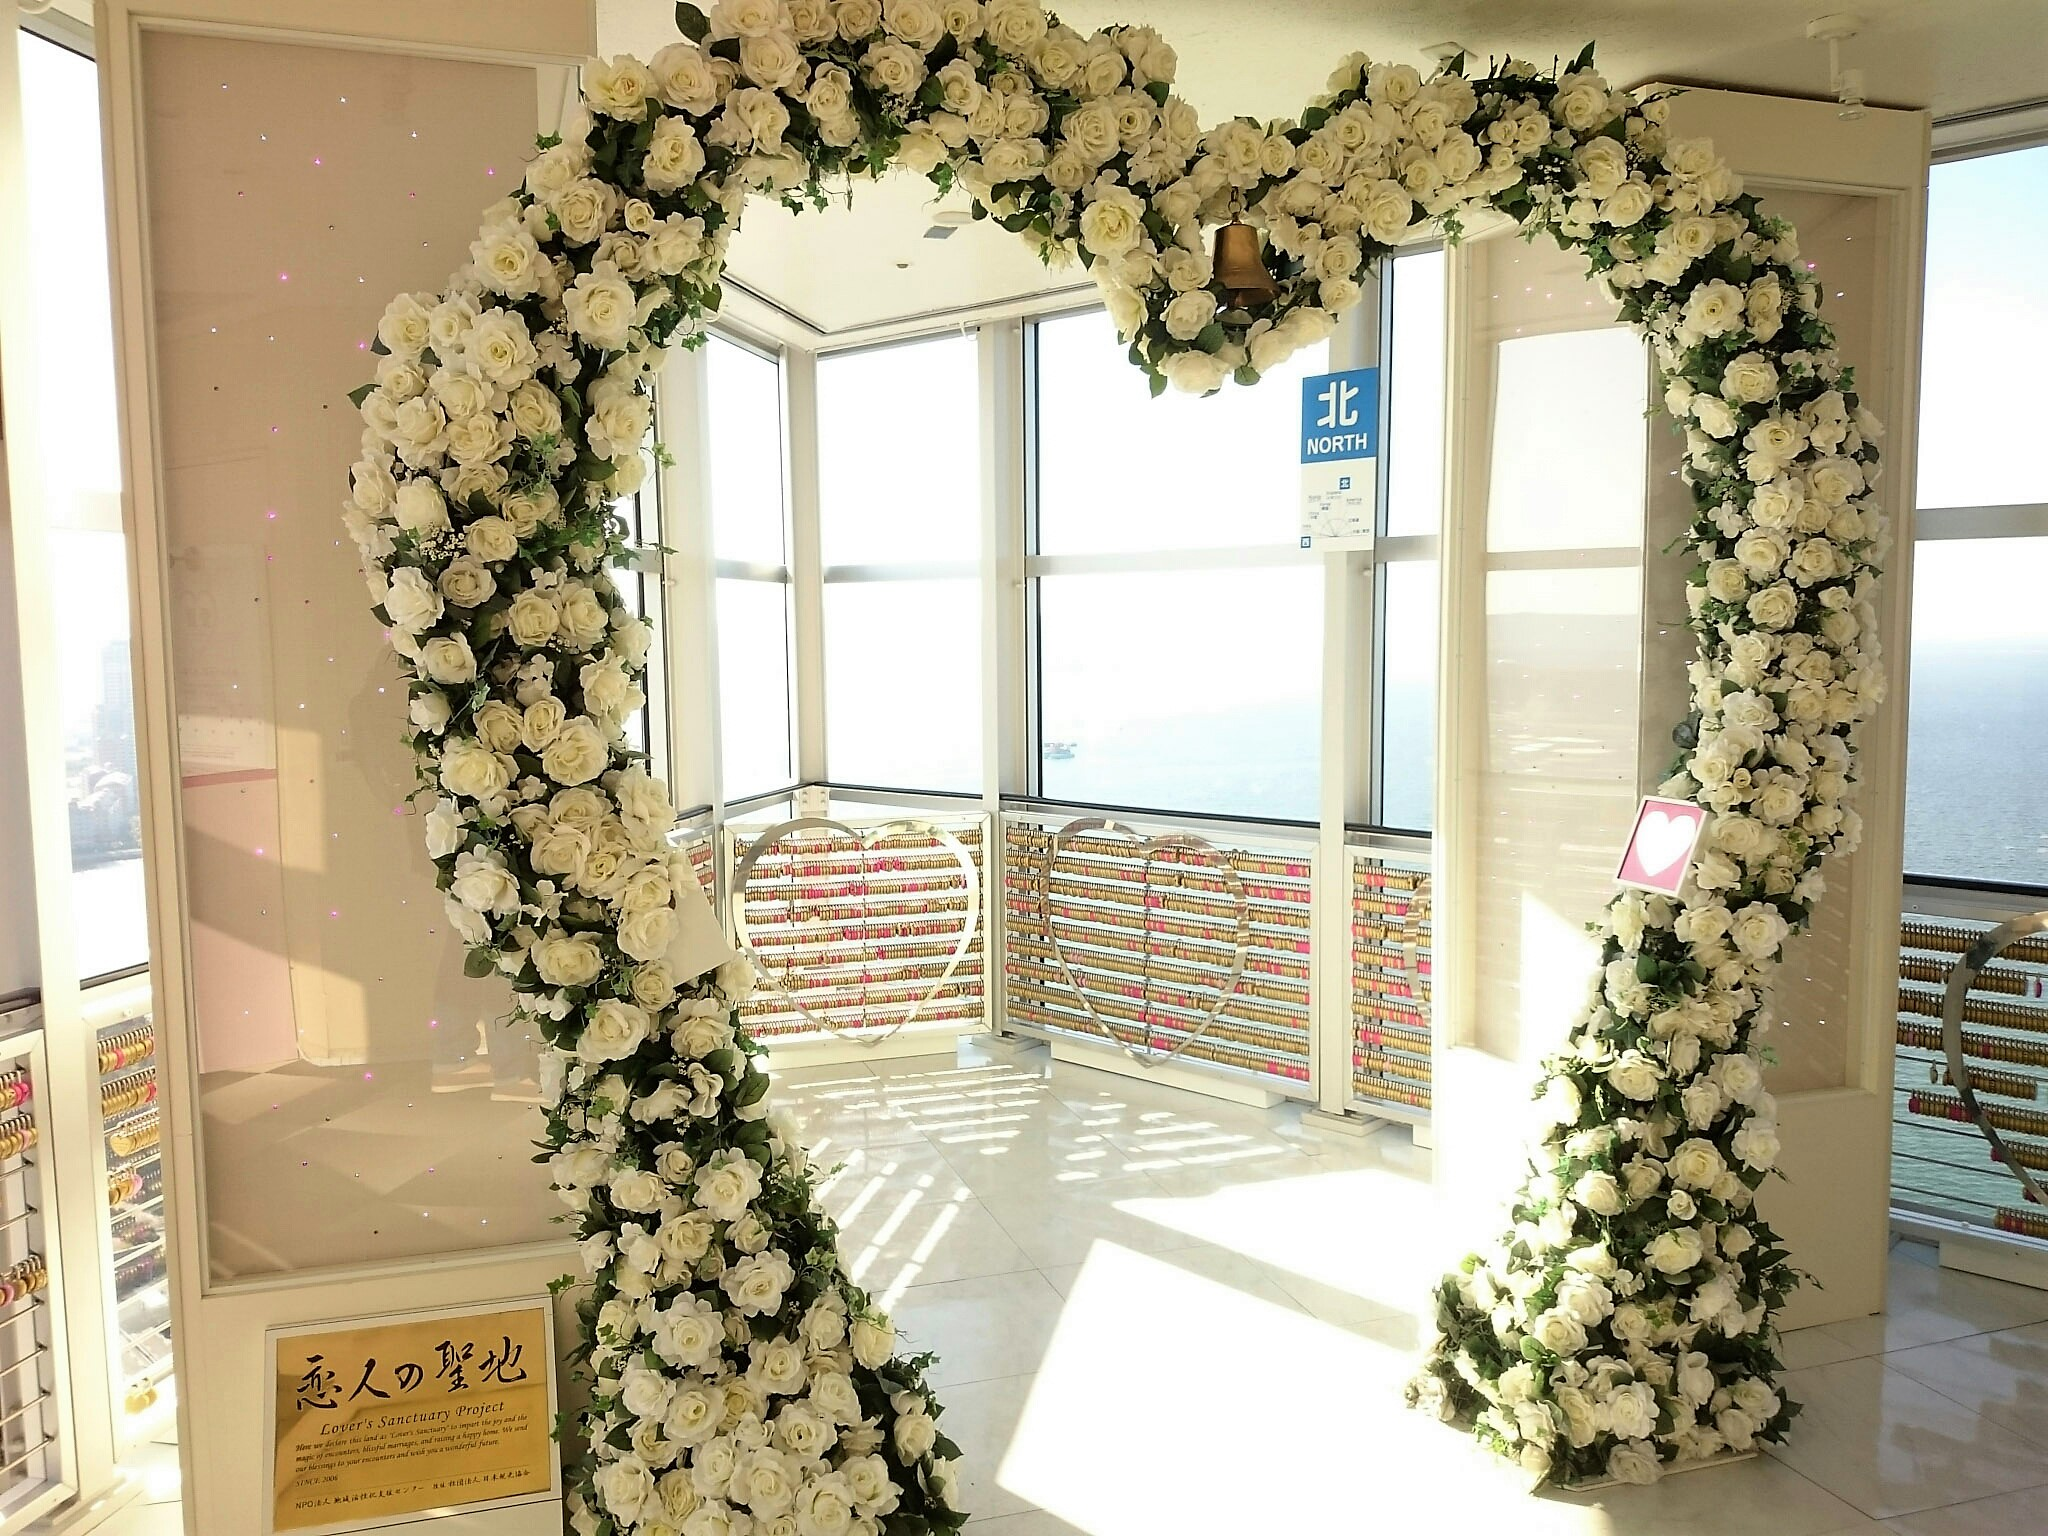 Lovers sanctuary, Fukuoka tower